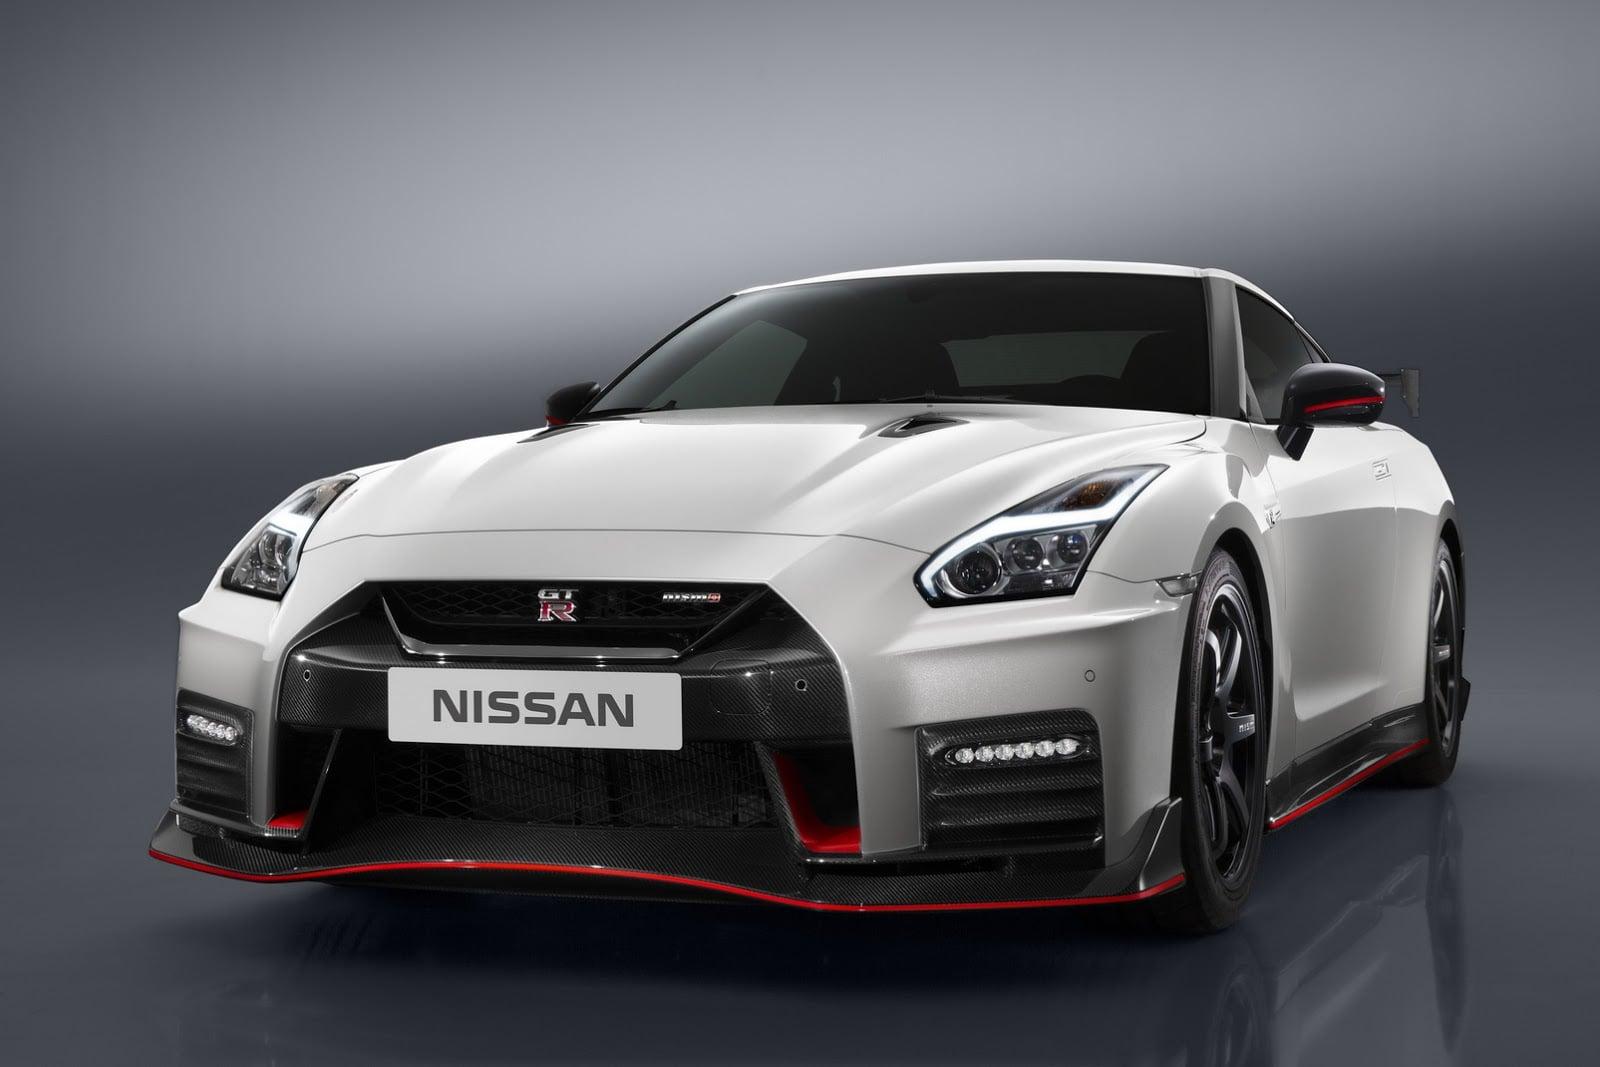 Fotogalerie: Nissan GT-R Nismo (2017)